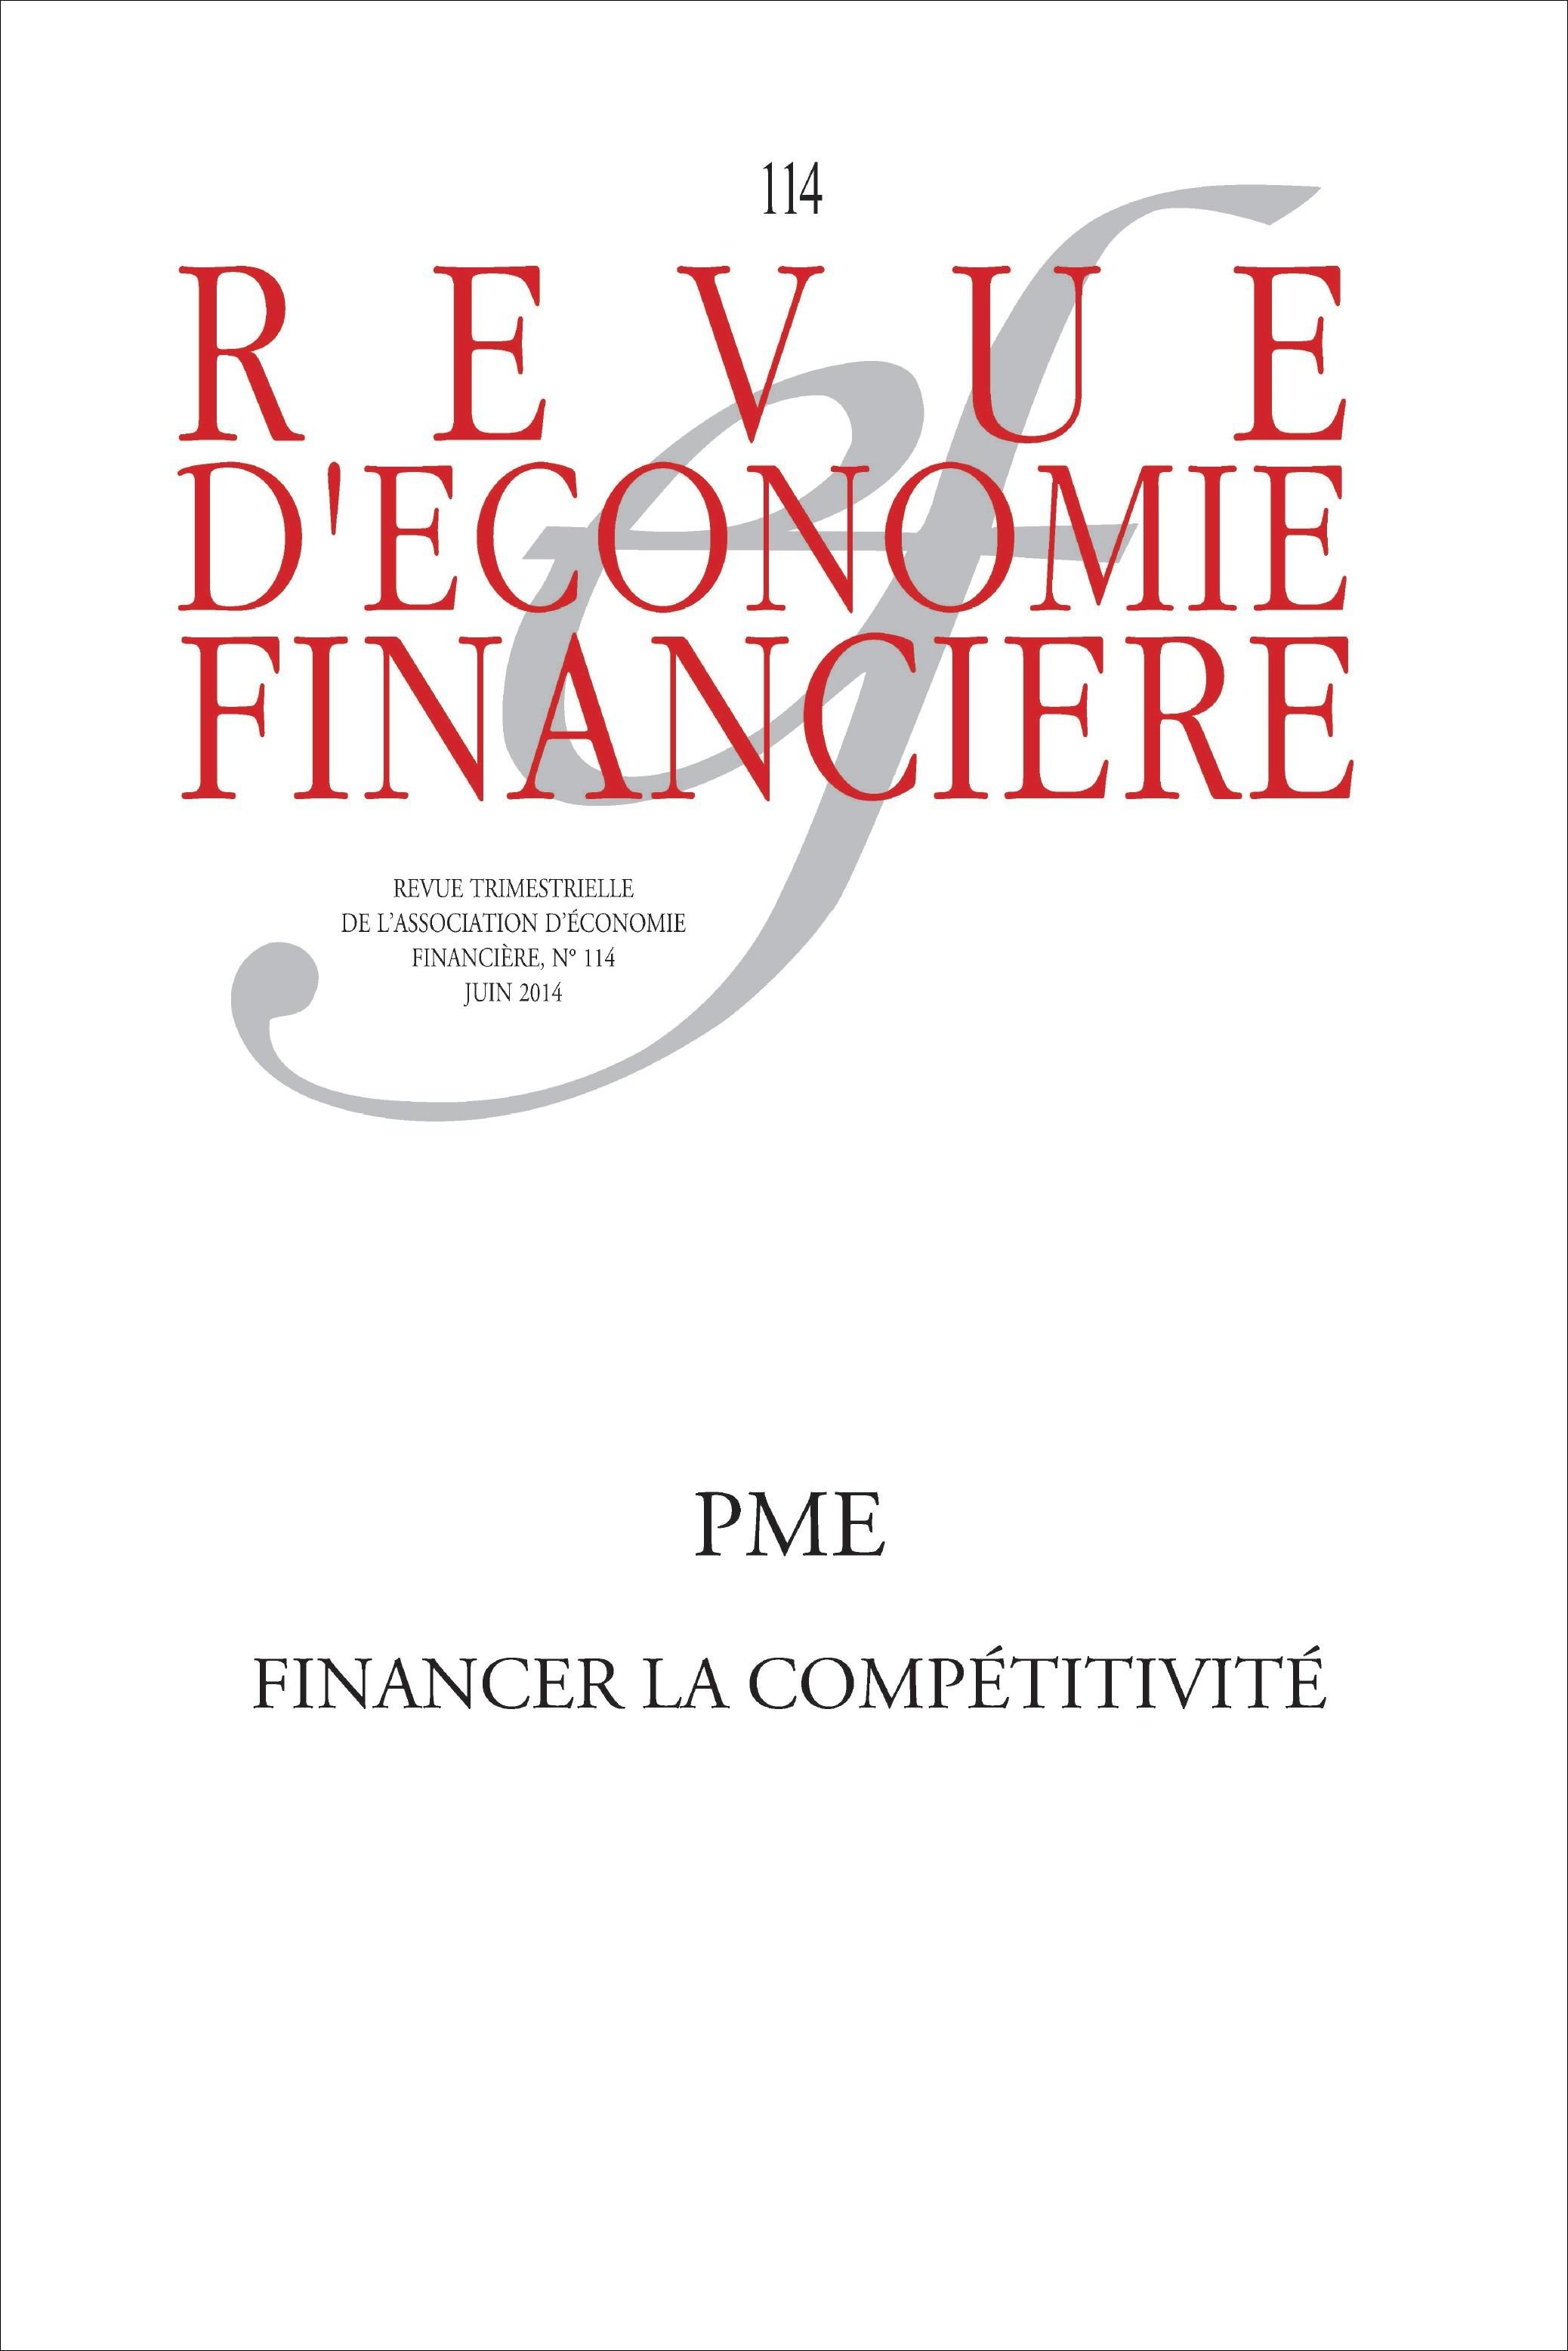 Collectif Aef Pme  Financer La Competitivite  N 114  Juin 2014